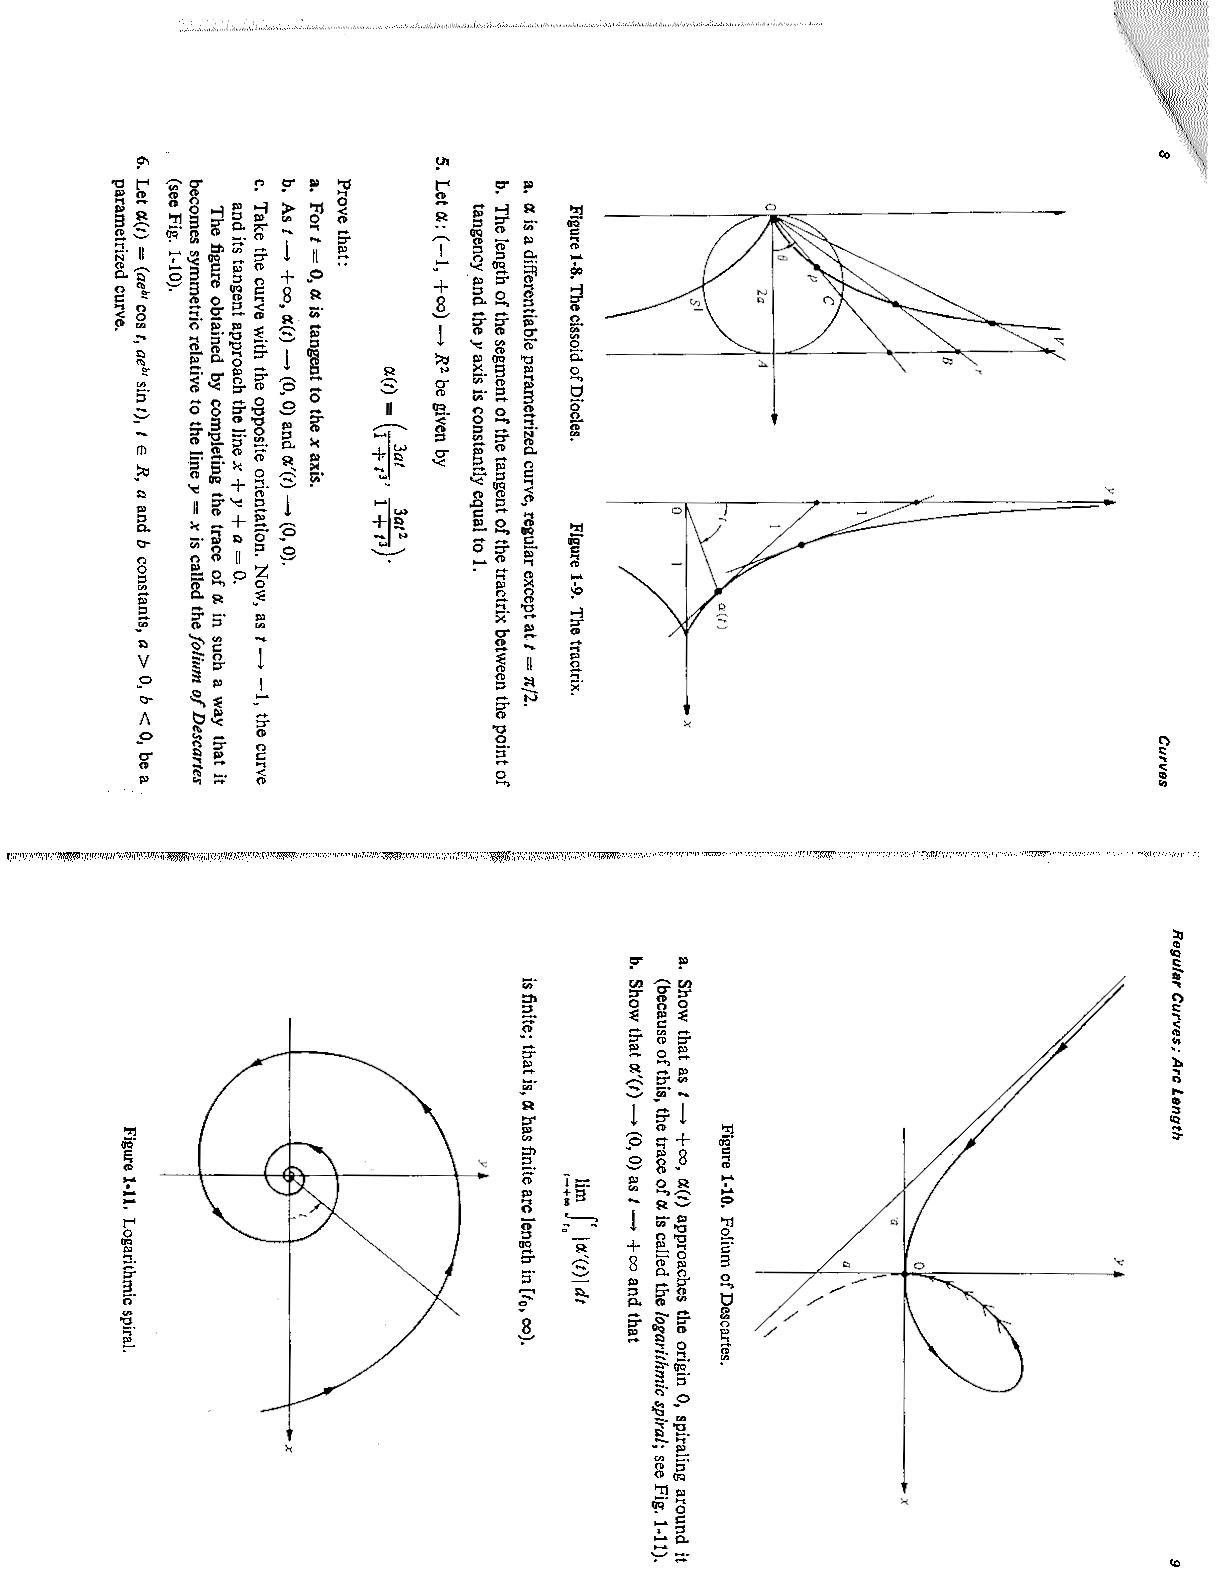 MATH 320: Course Description